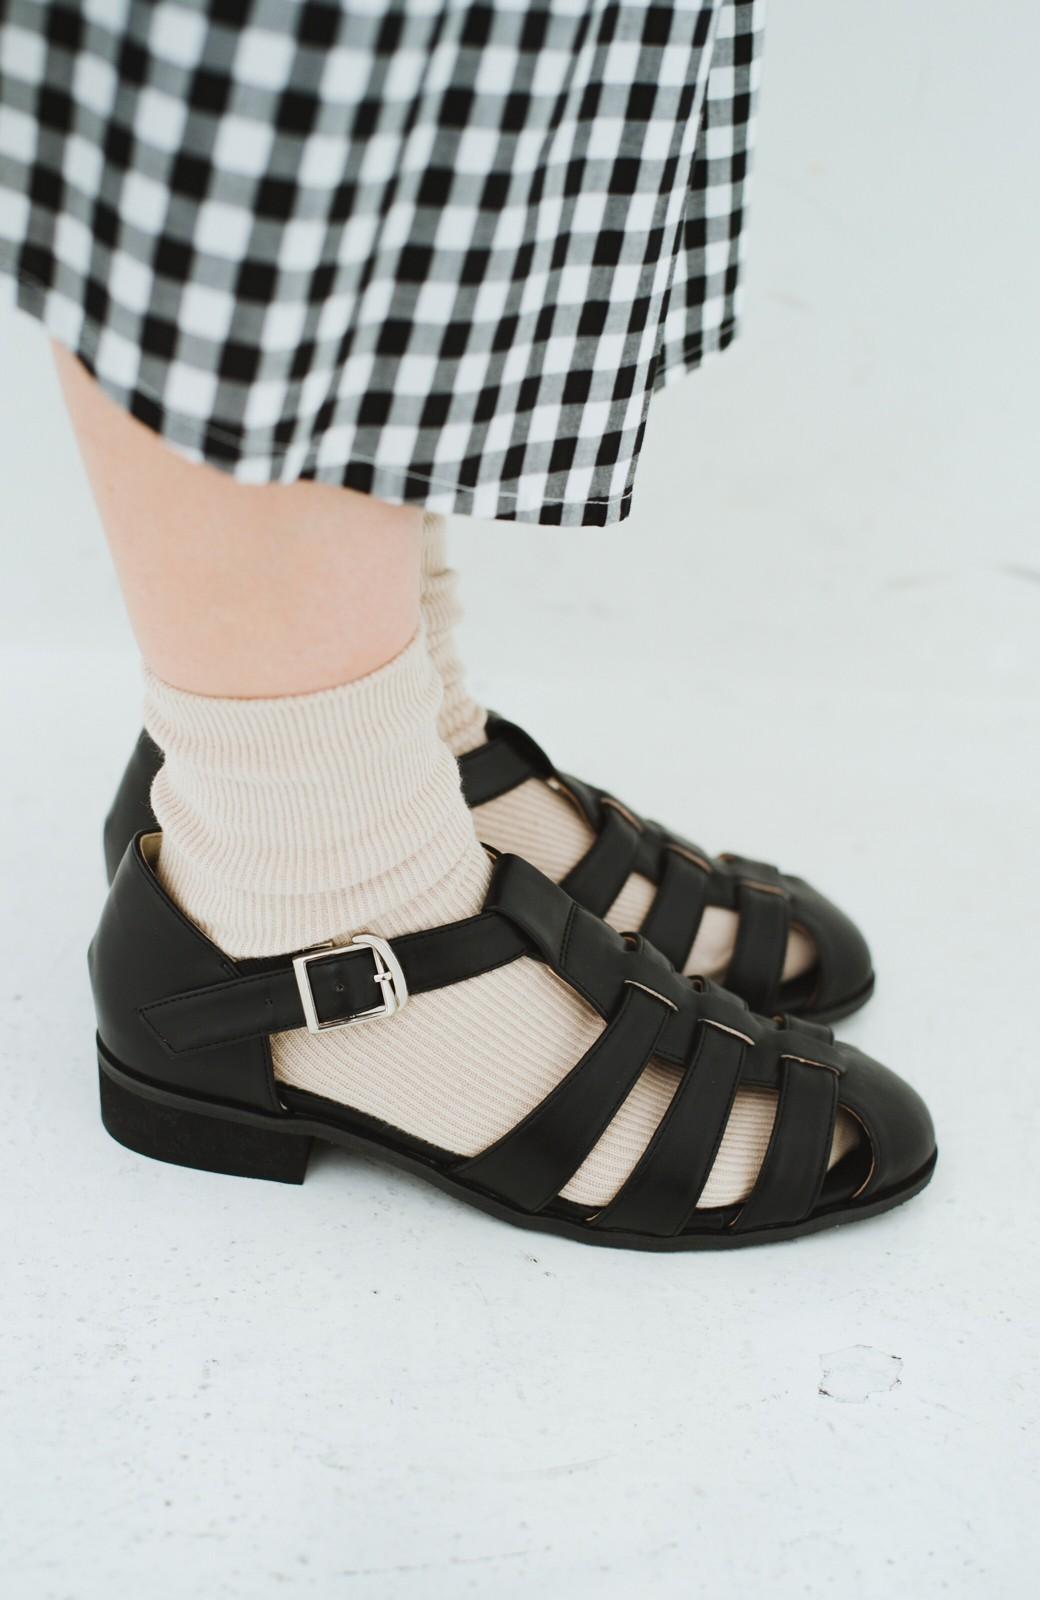 haco! 靴下でも素足でも合う 本革風編み込みサンダル <ブラック>の商品写真10